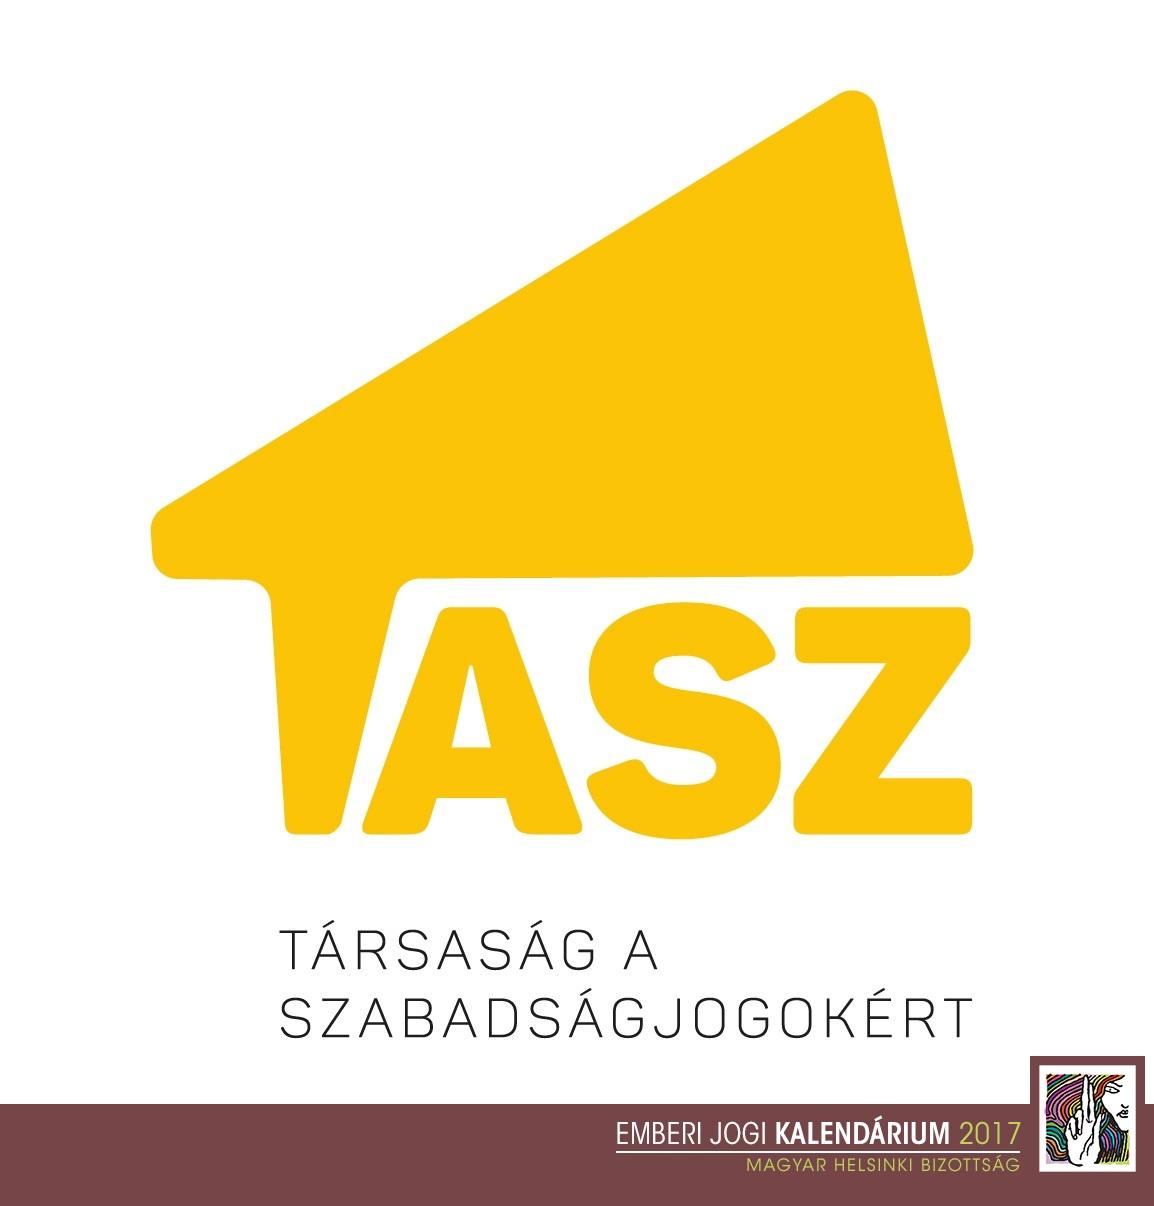 0414_tasz.jpg